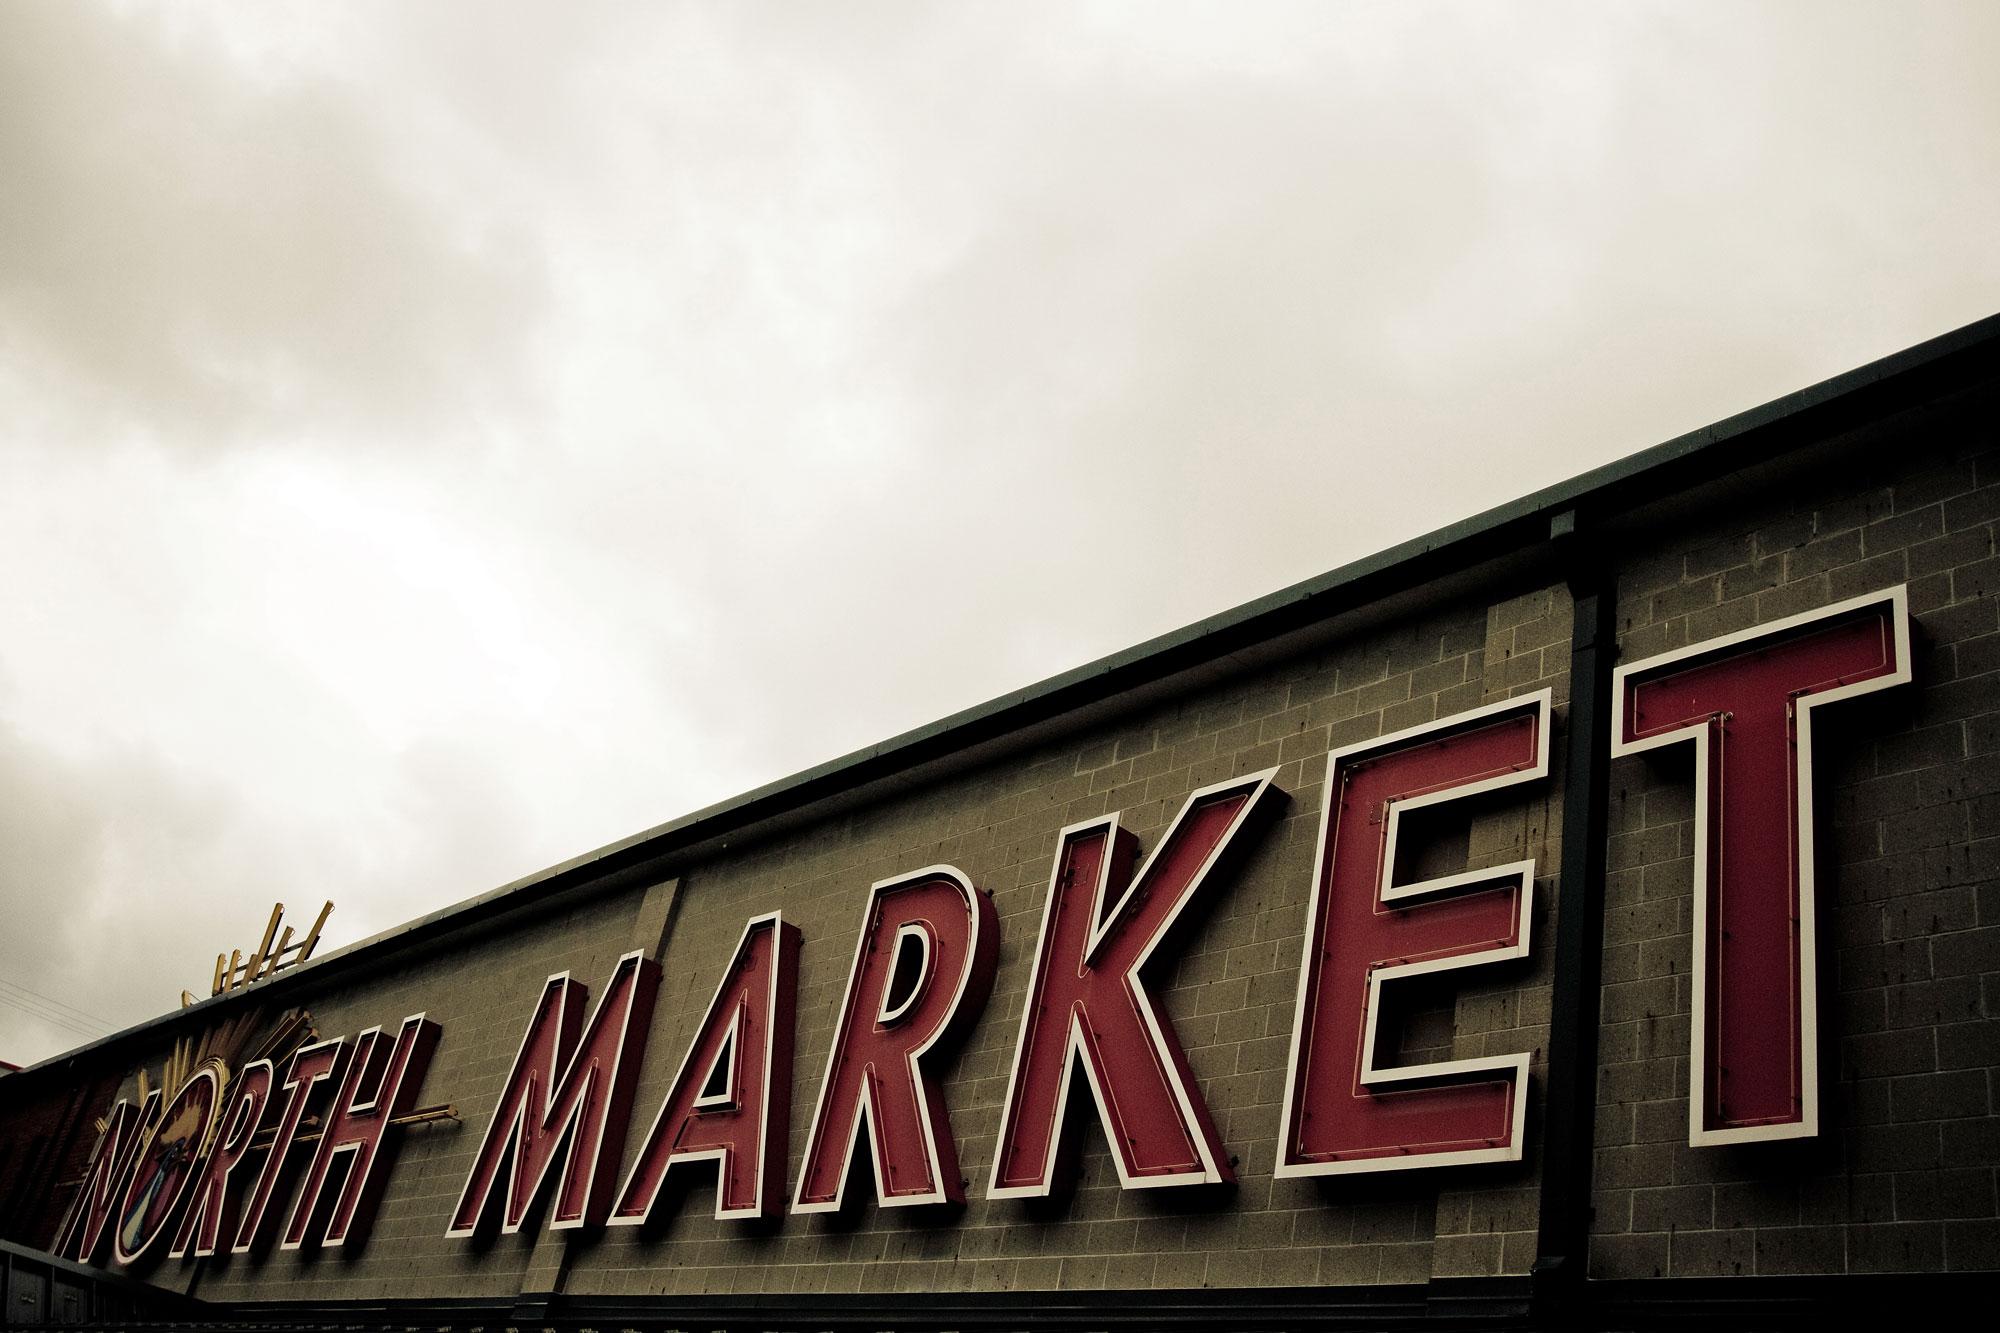 north market signage